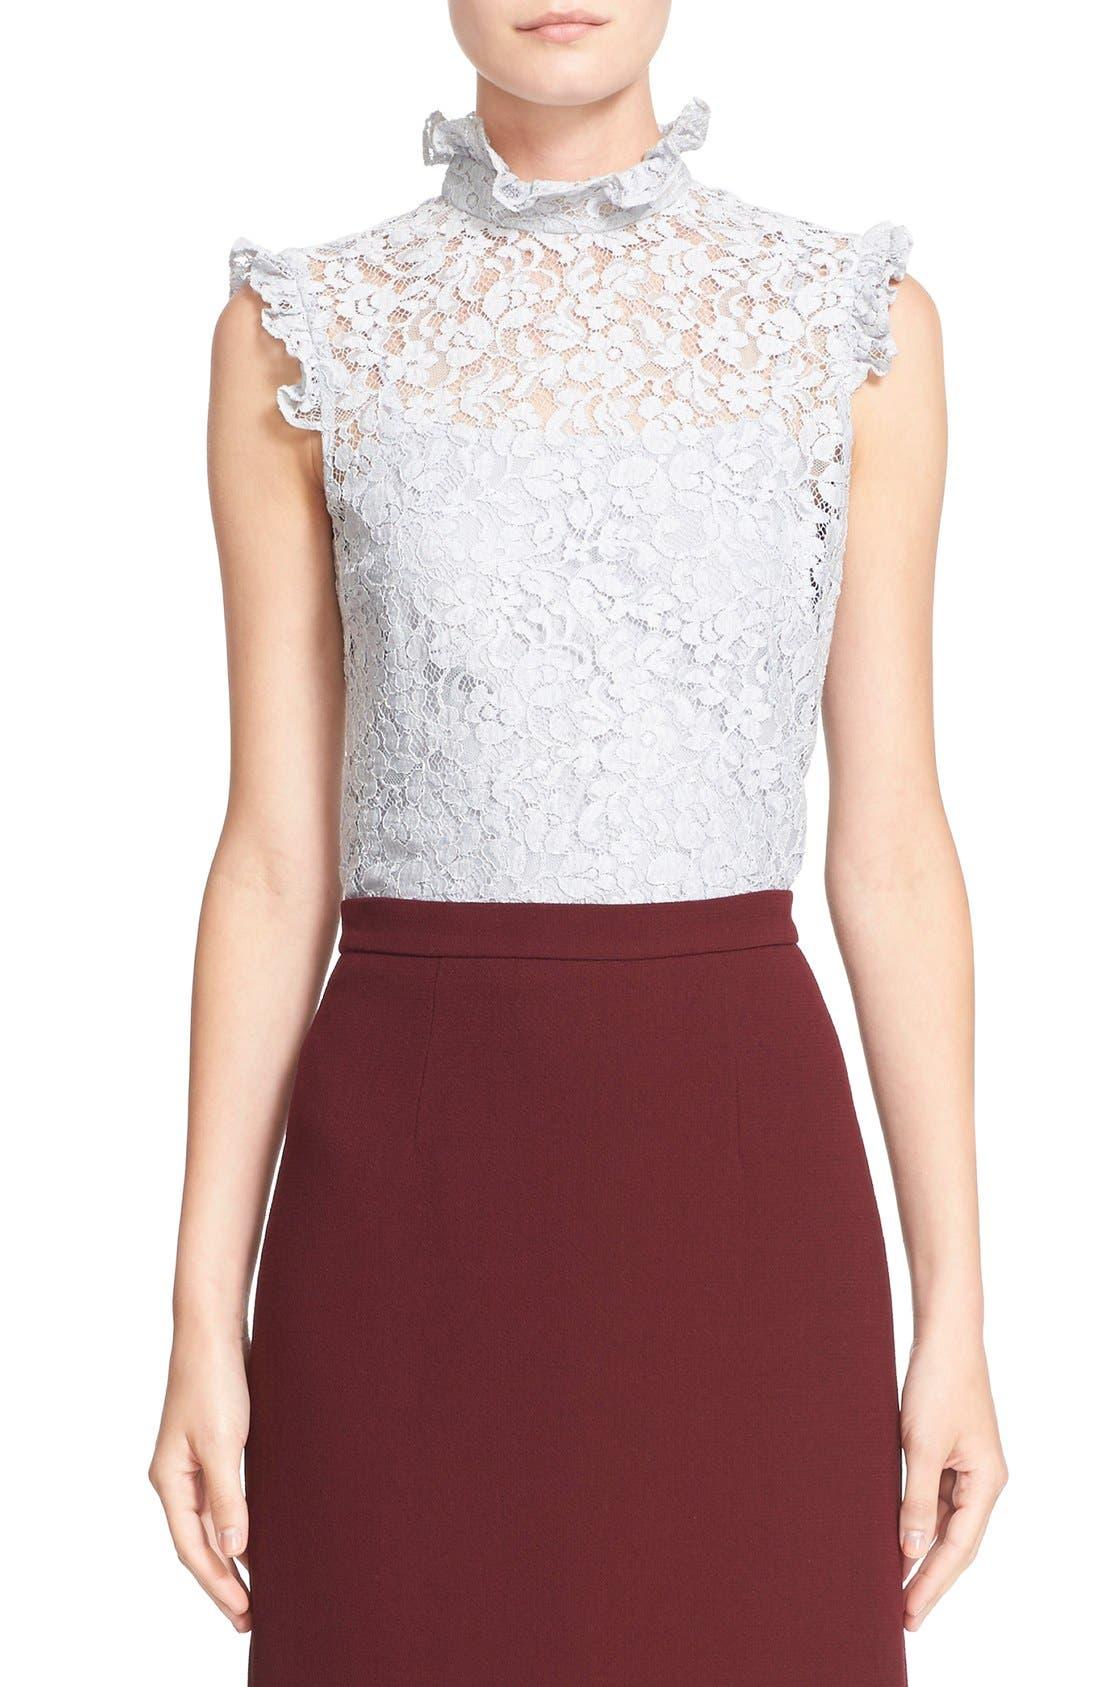 'Mika' Floral Lace High Collar Blouse,                             Main thumbnail 1, color,                             450